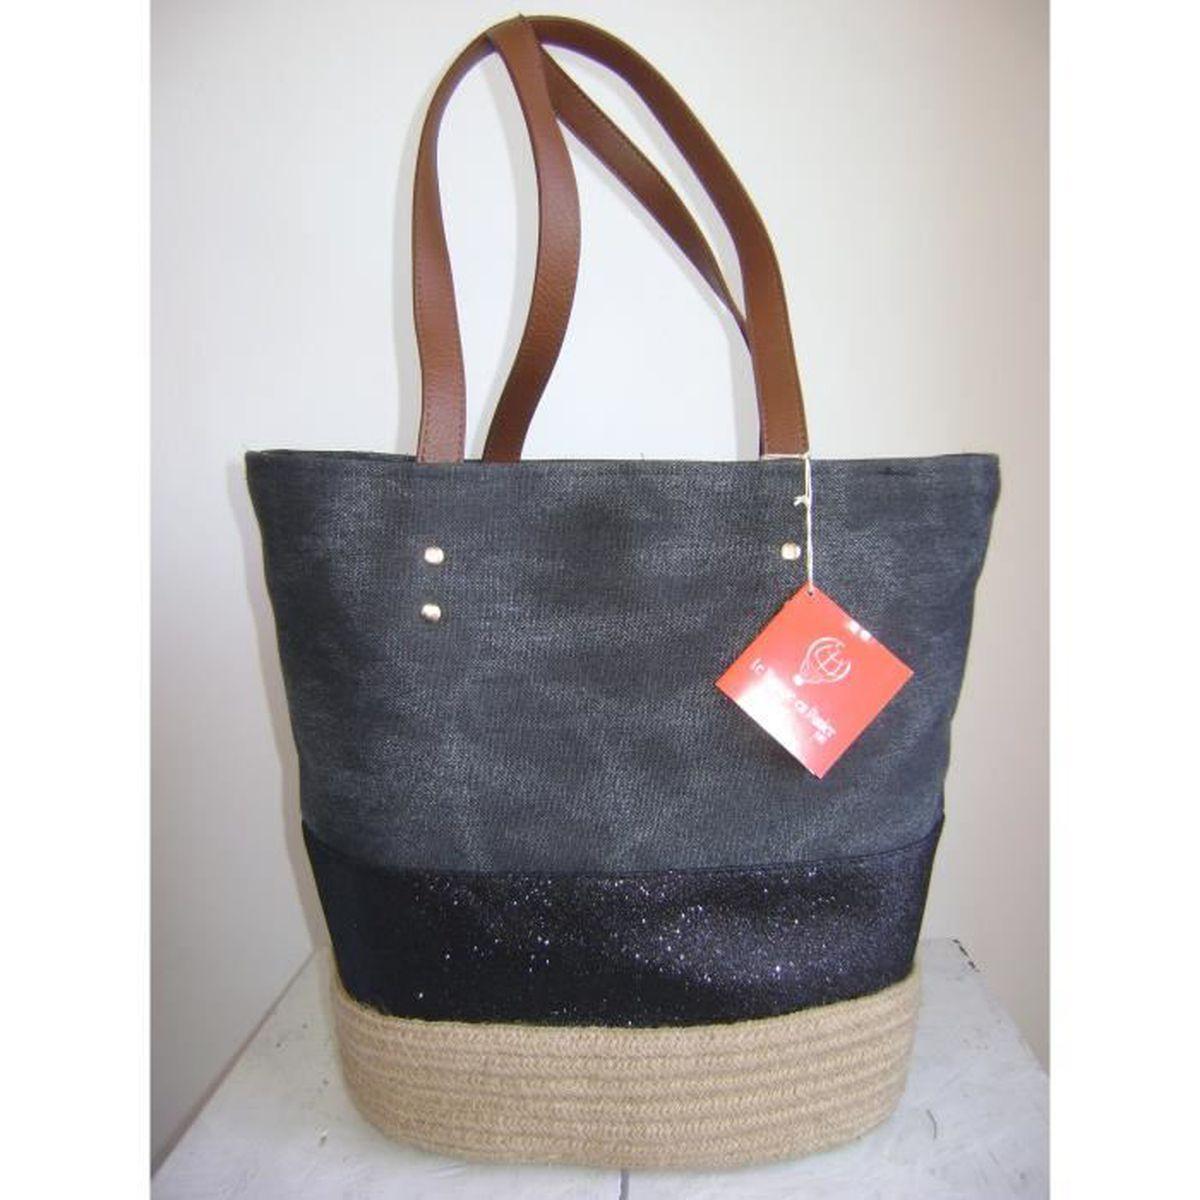 sac cabas le voyage en panier toile vintage corde noir achat vente sac cabas le voyage en. Black Bedroom Furniture Sets. Home Design Ideas